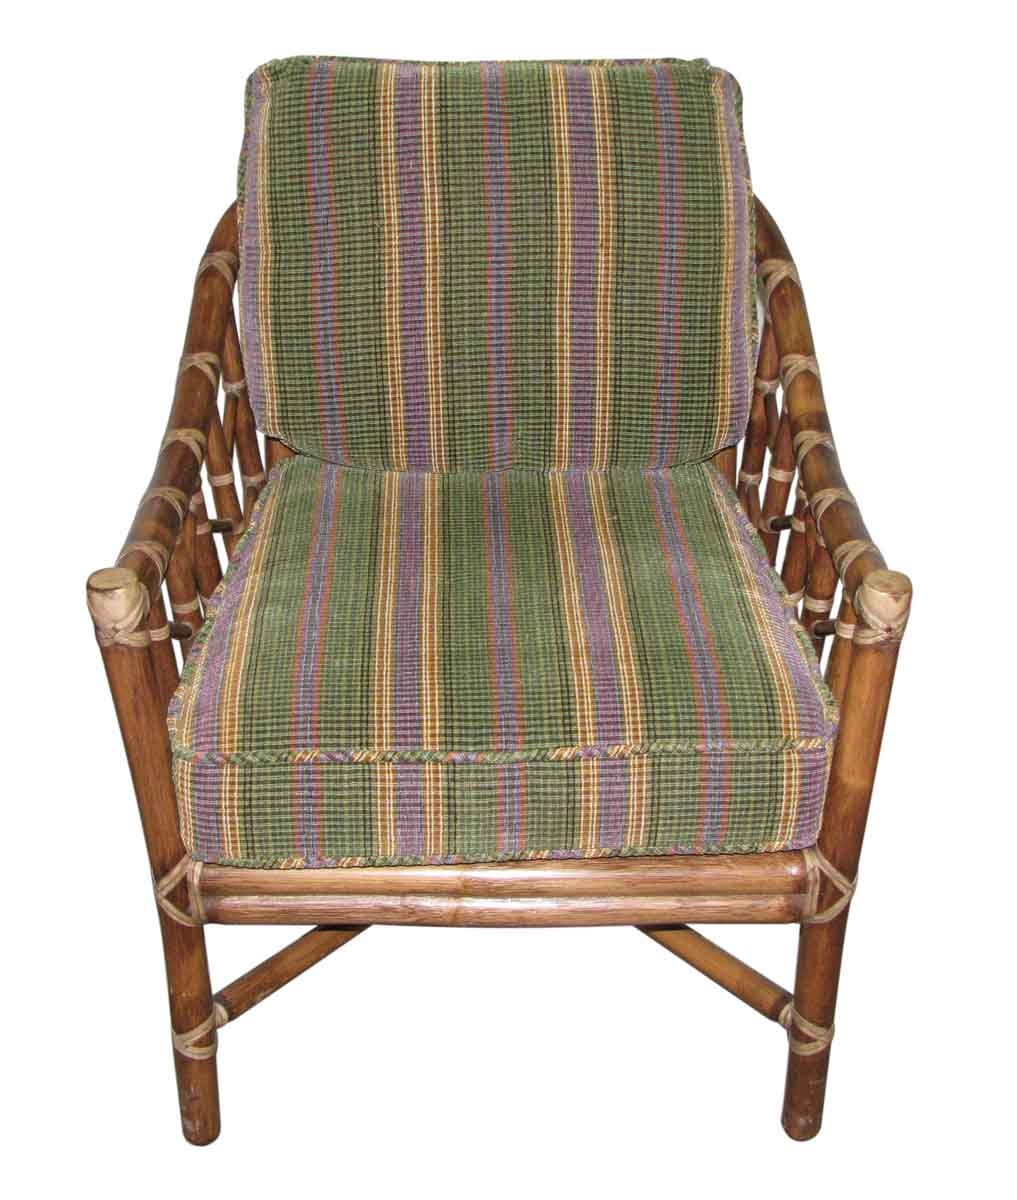 Bamboo Patio Chair